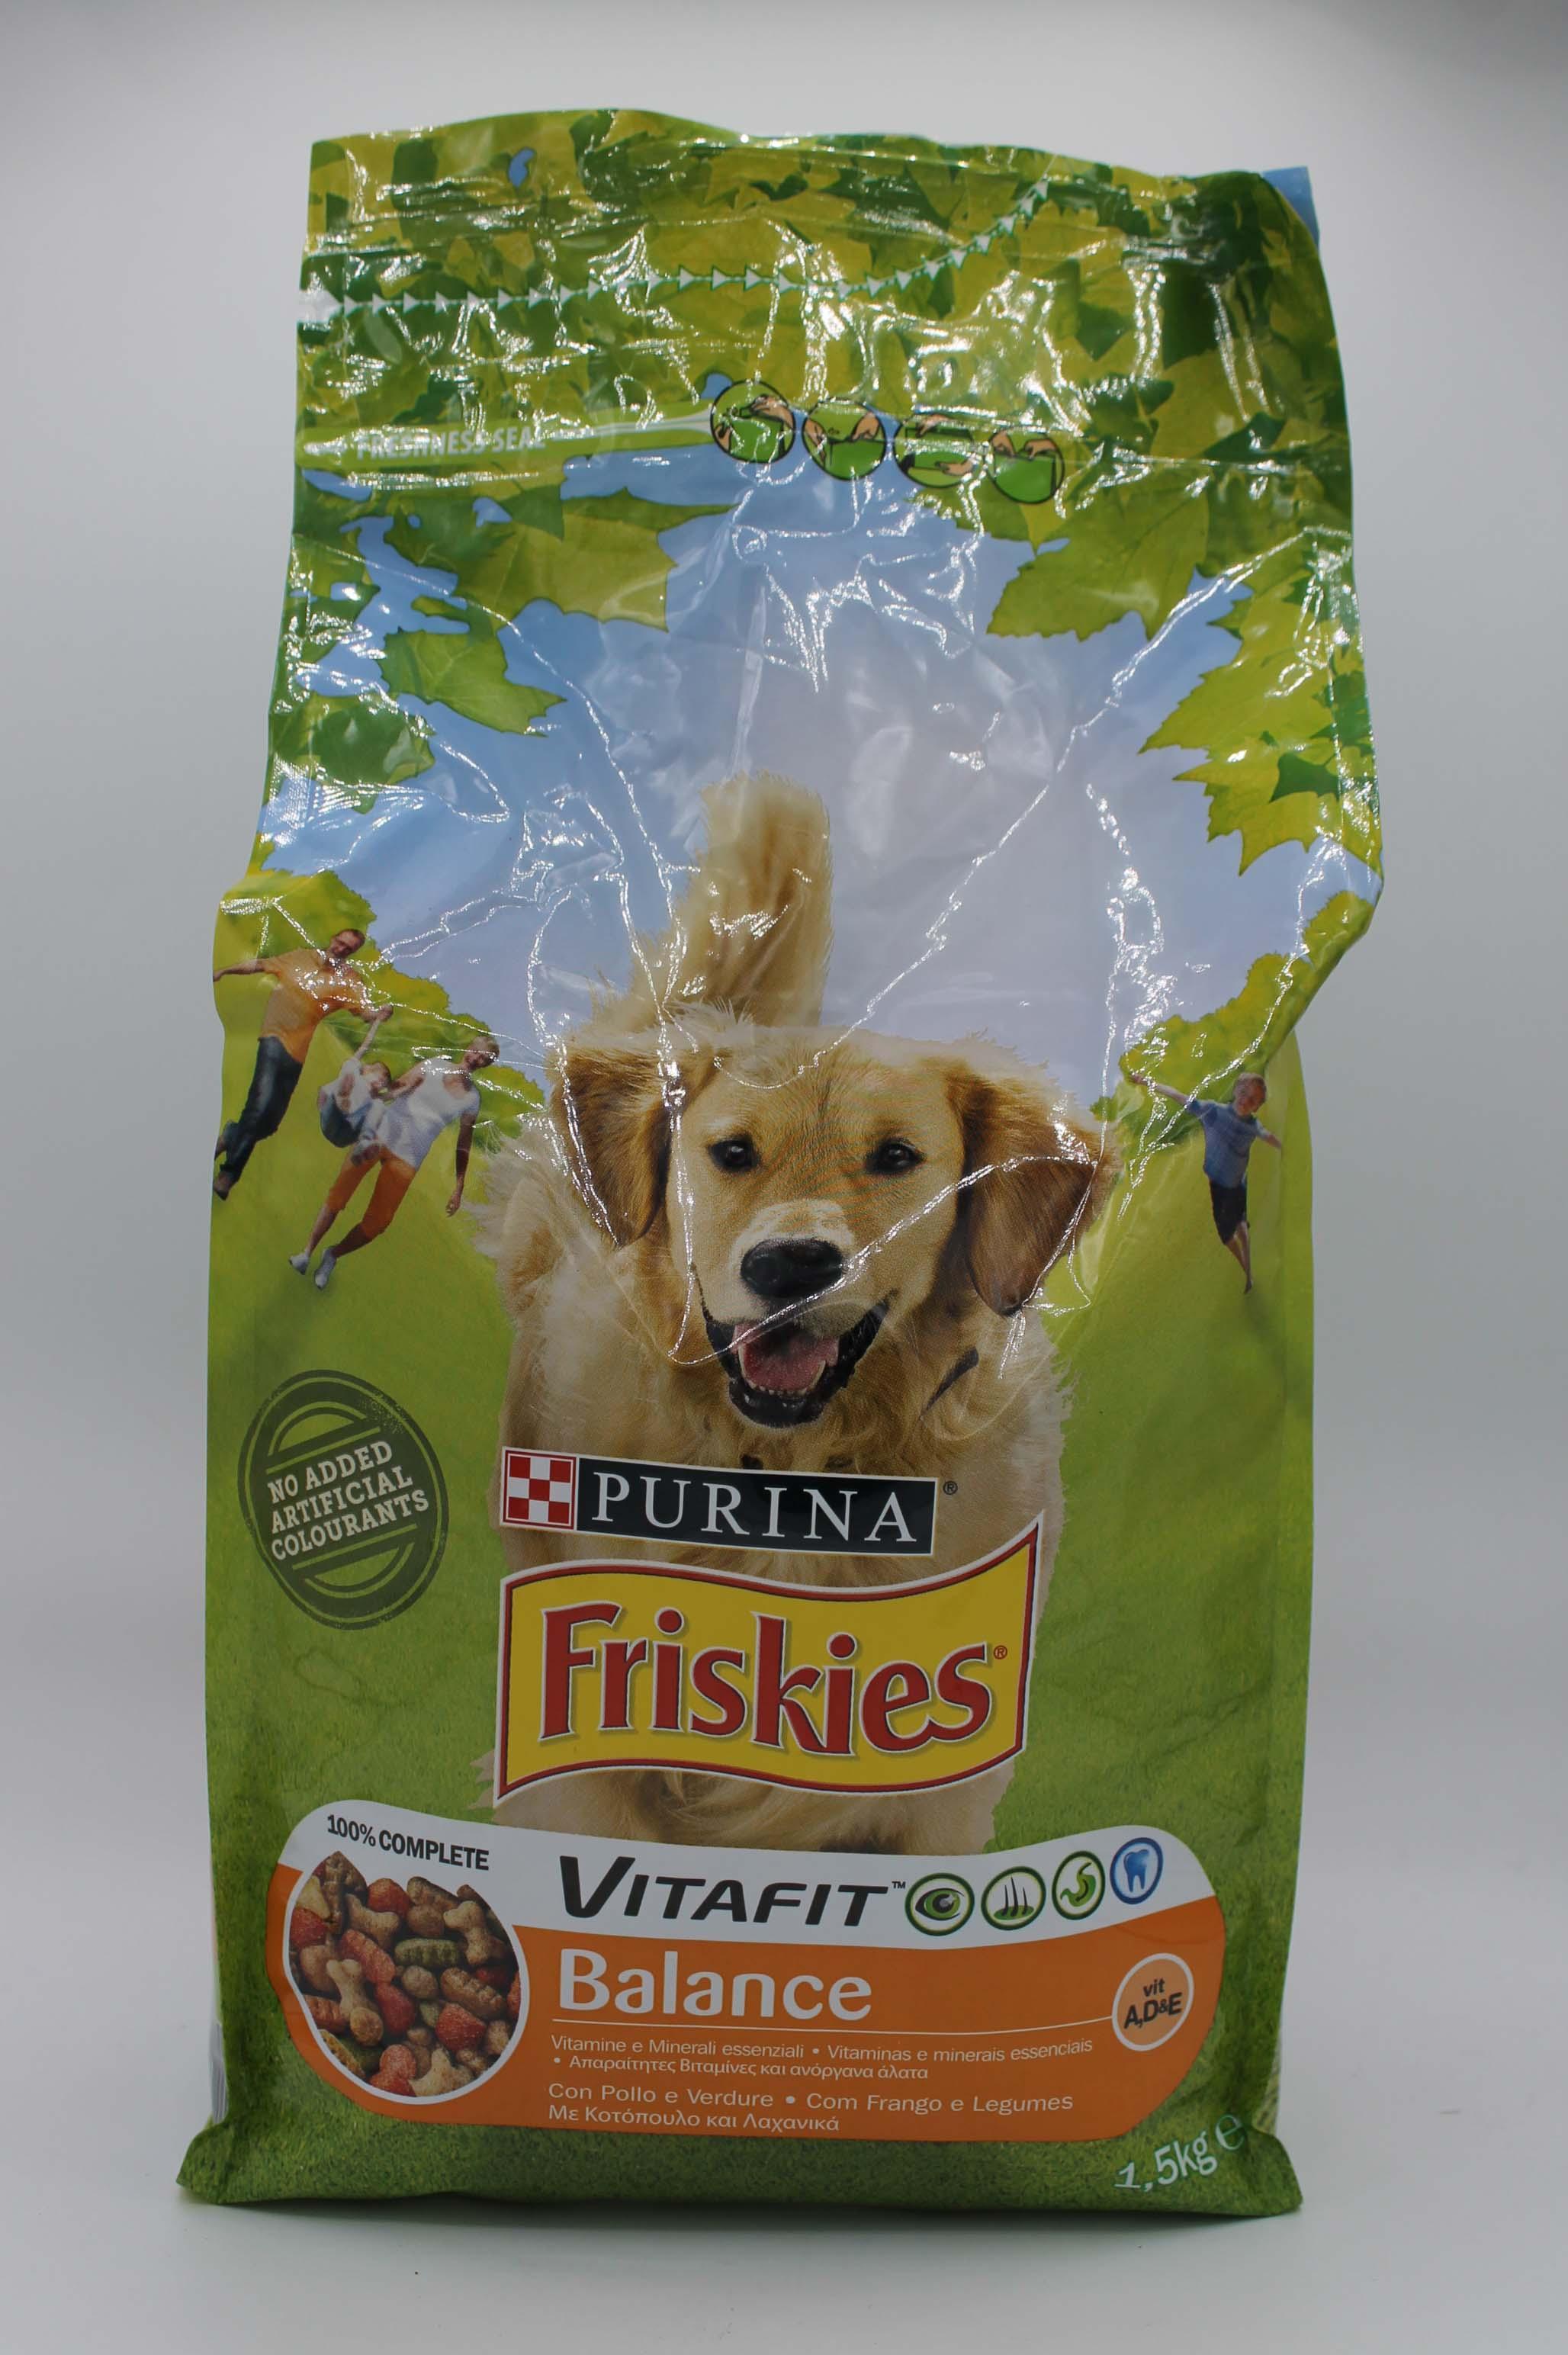 Purina Friskies pasto completo cane 1,5kg.